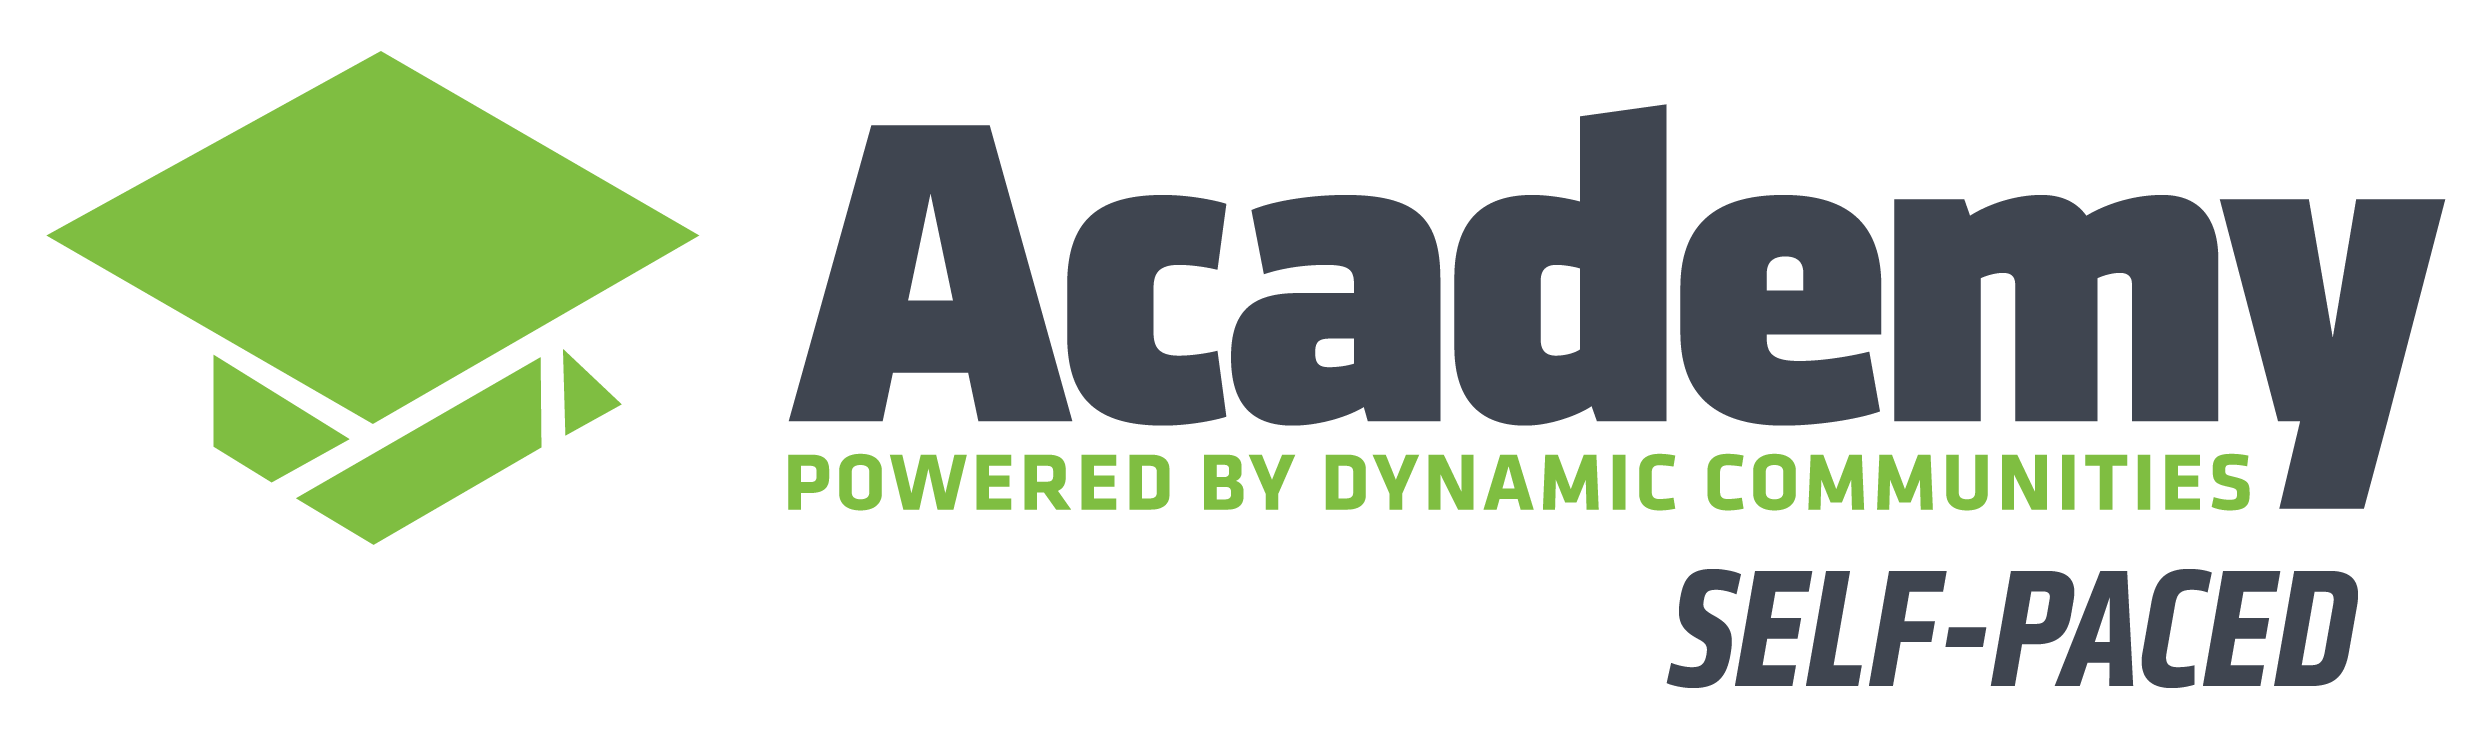 Academy Powered By Dynamic Communities Logo